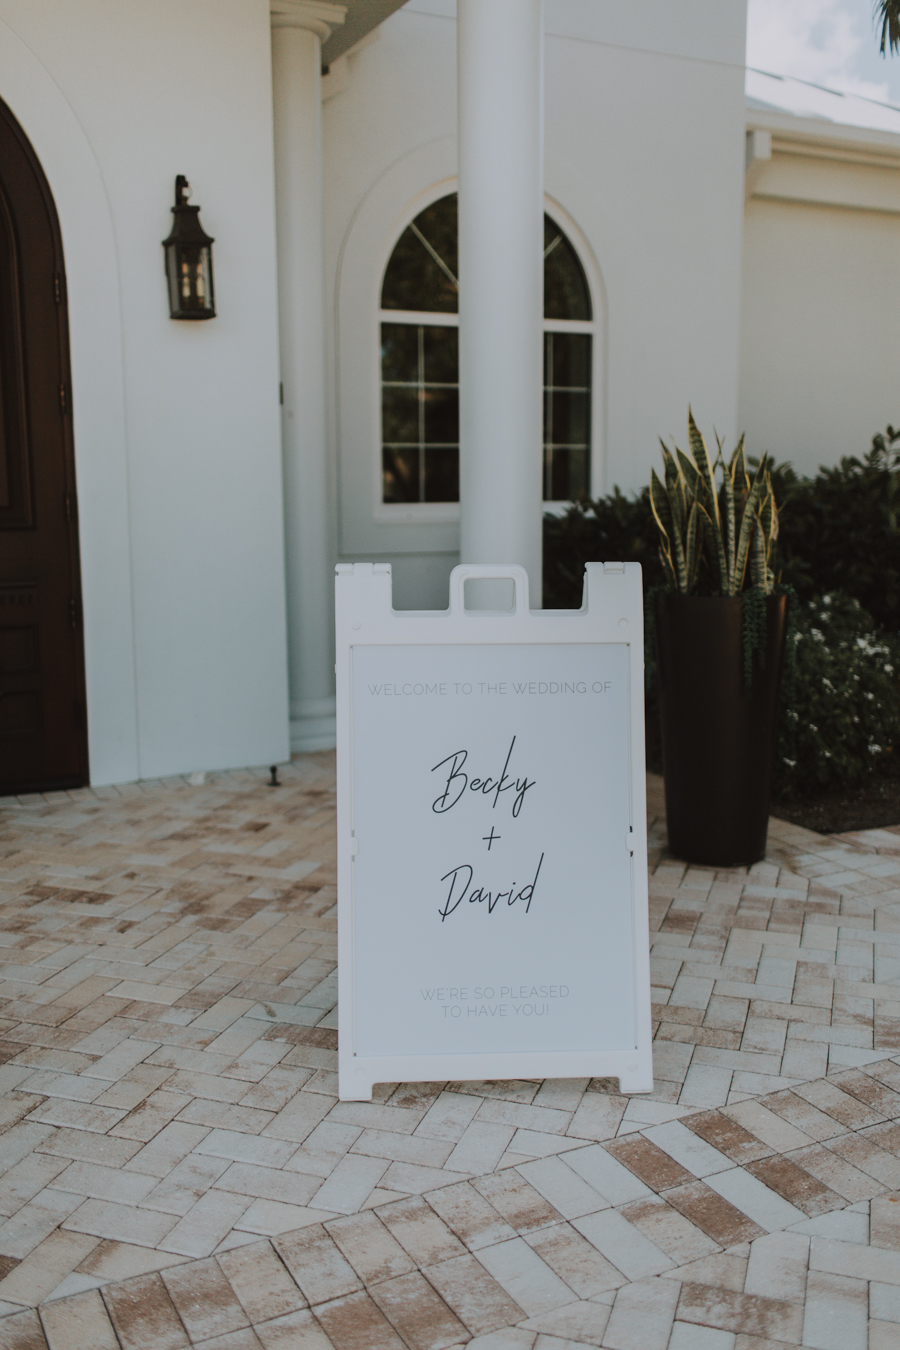 Harborside Chapel Wedding Clearwater Affordable Tampa Venues BHLDN Palm Harbor Safety Harbor Resort and Spa Wedding Malindy Elene Bridal St Pete Wedding Photographer Tampa Wedding Photographer-7.jpg